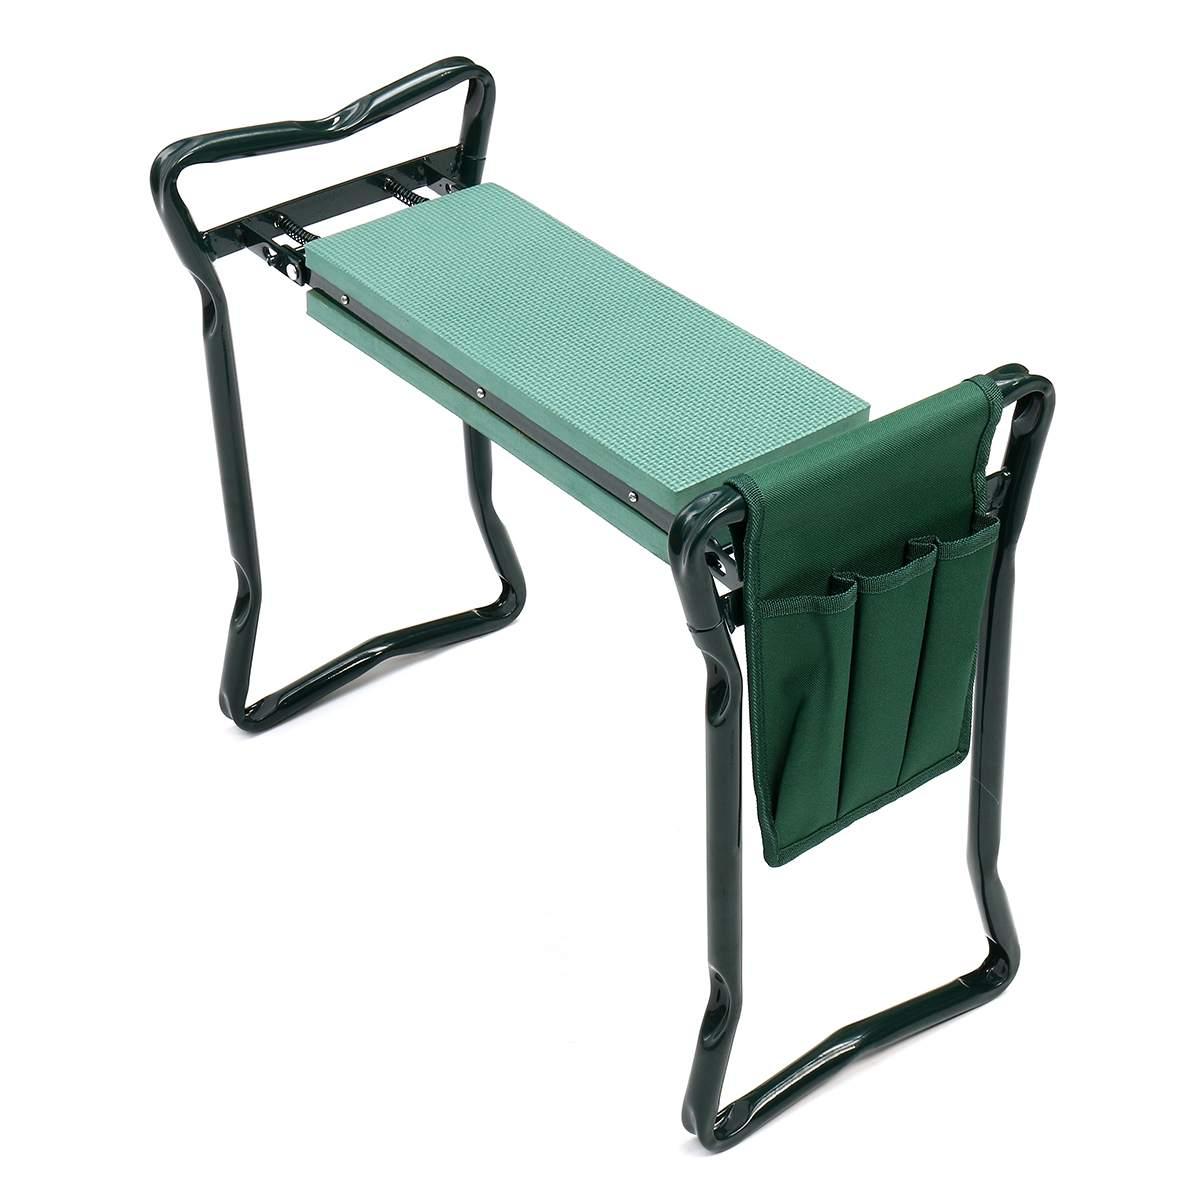 Free Shipping Garden Kneeler With Folding Handles